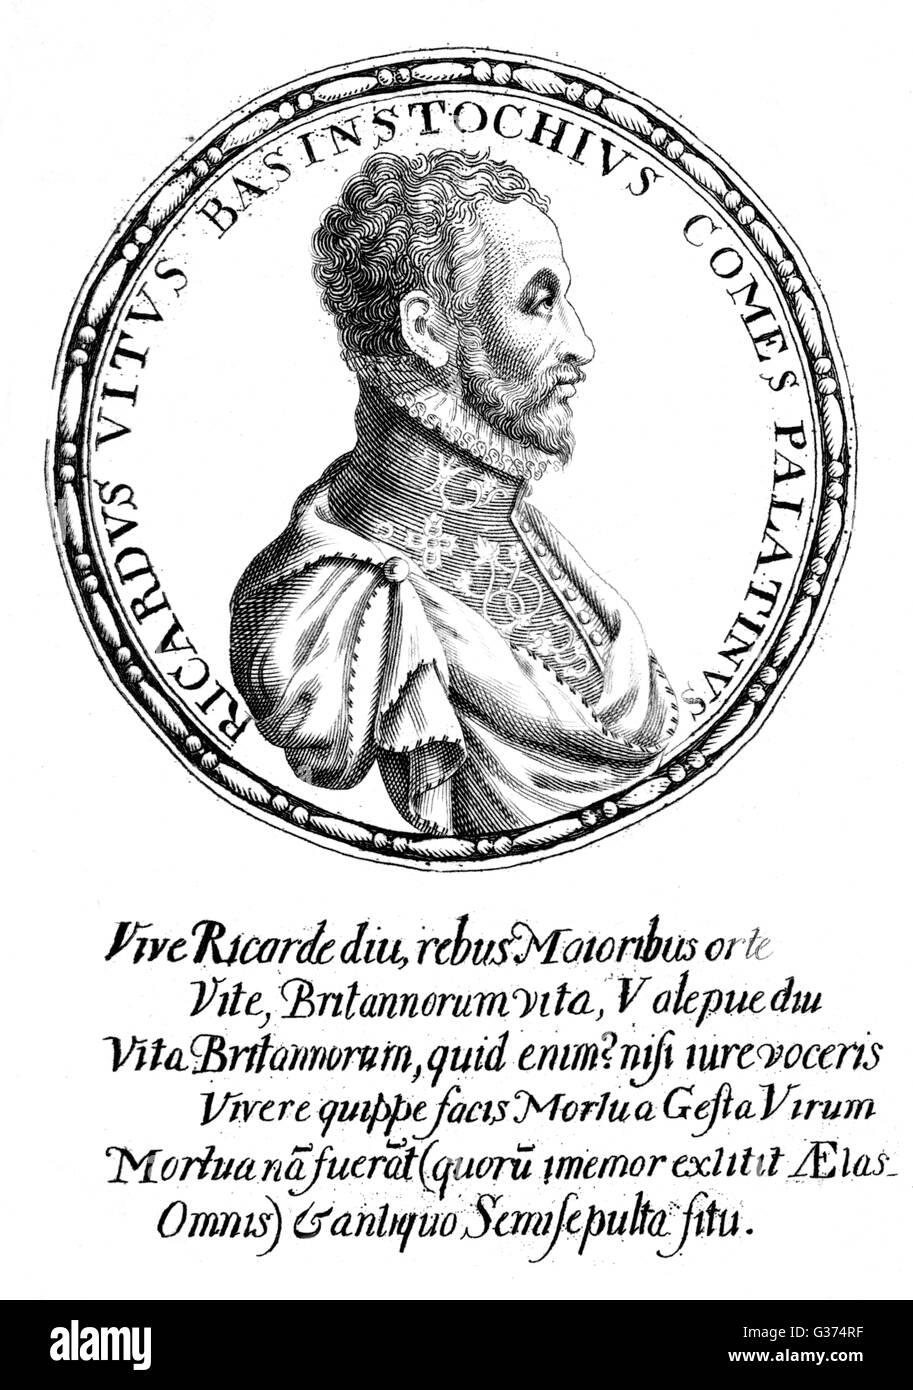 RICHARD WHITE jurist and historian         Date: 1539 - 1611 - Stock Image